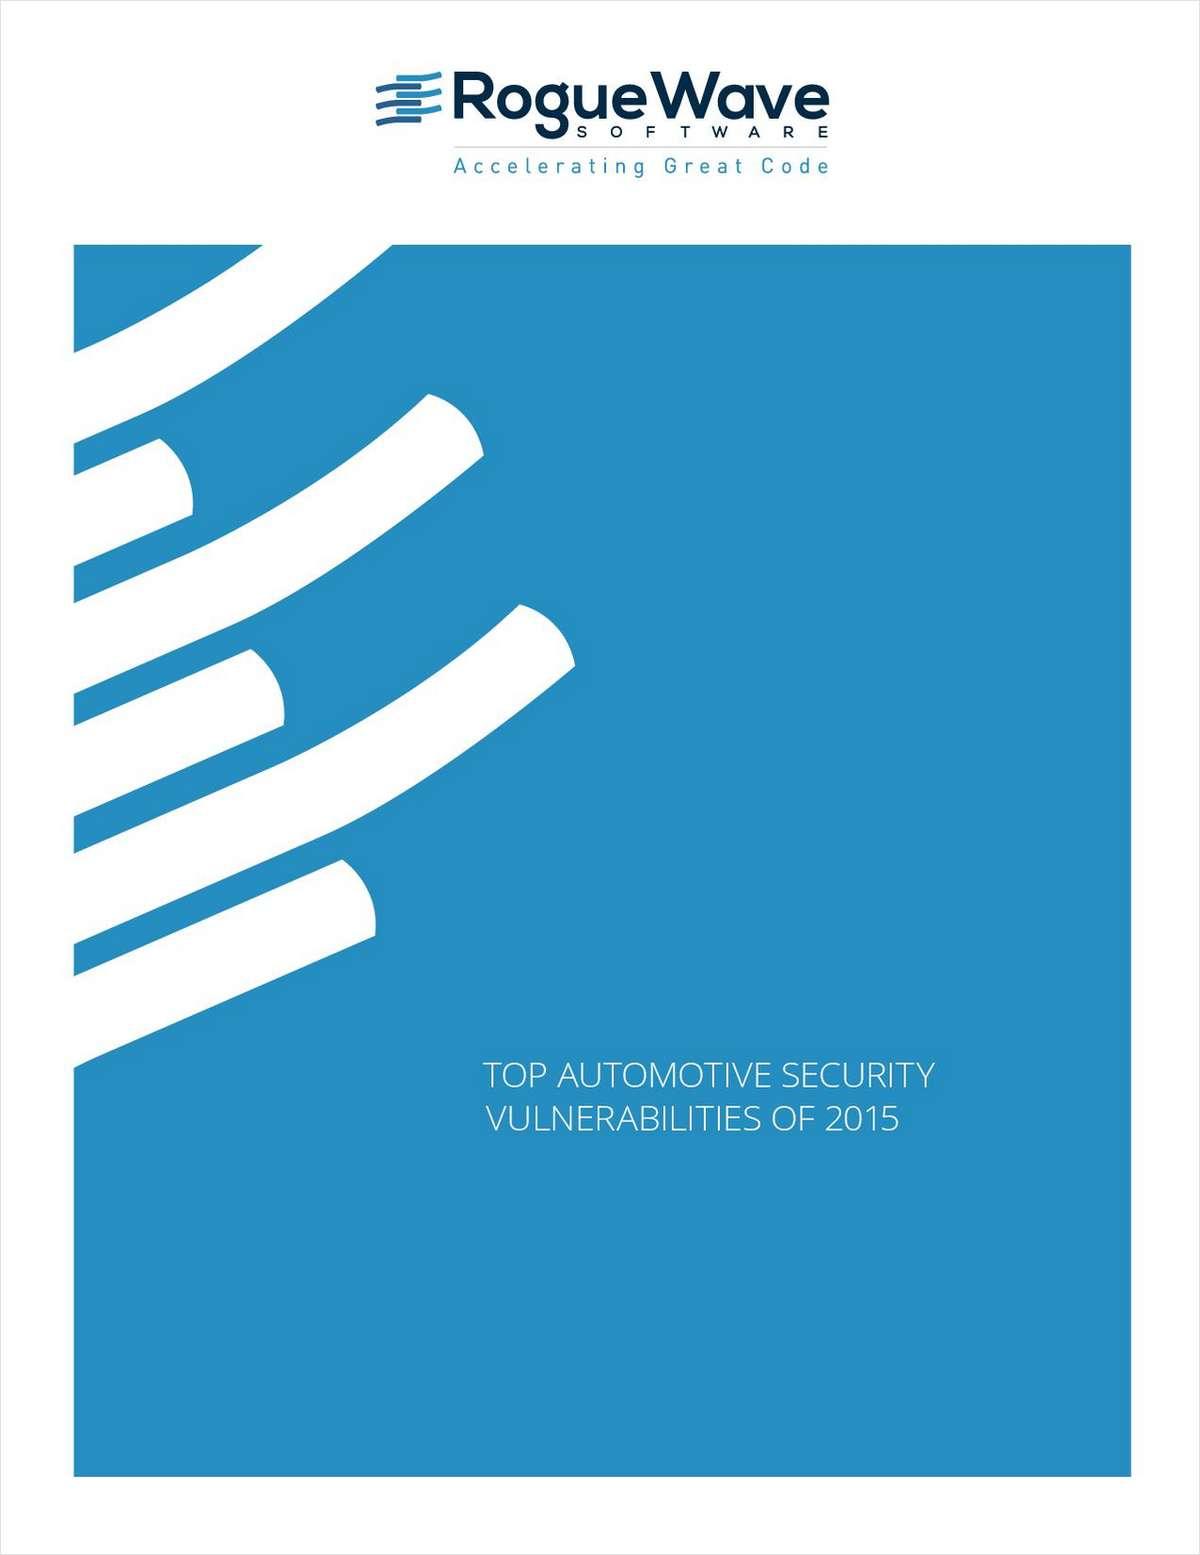 Top Automotive Security Vulnerabilities